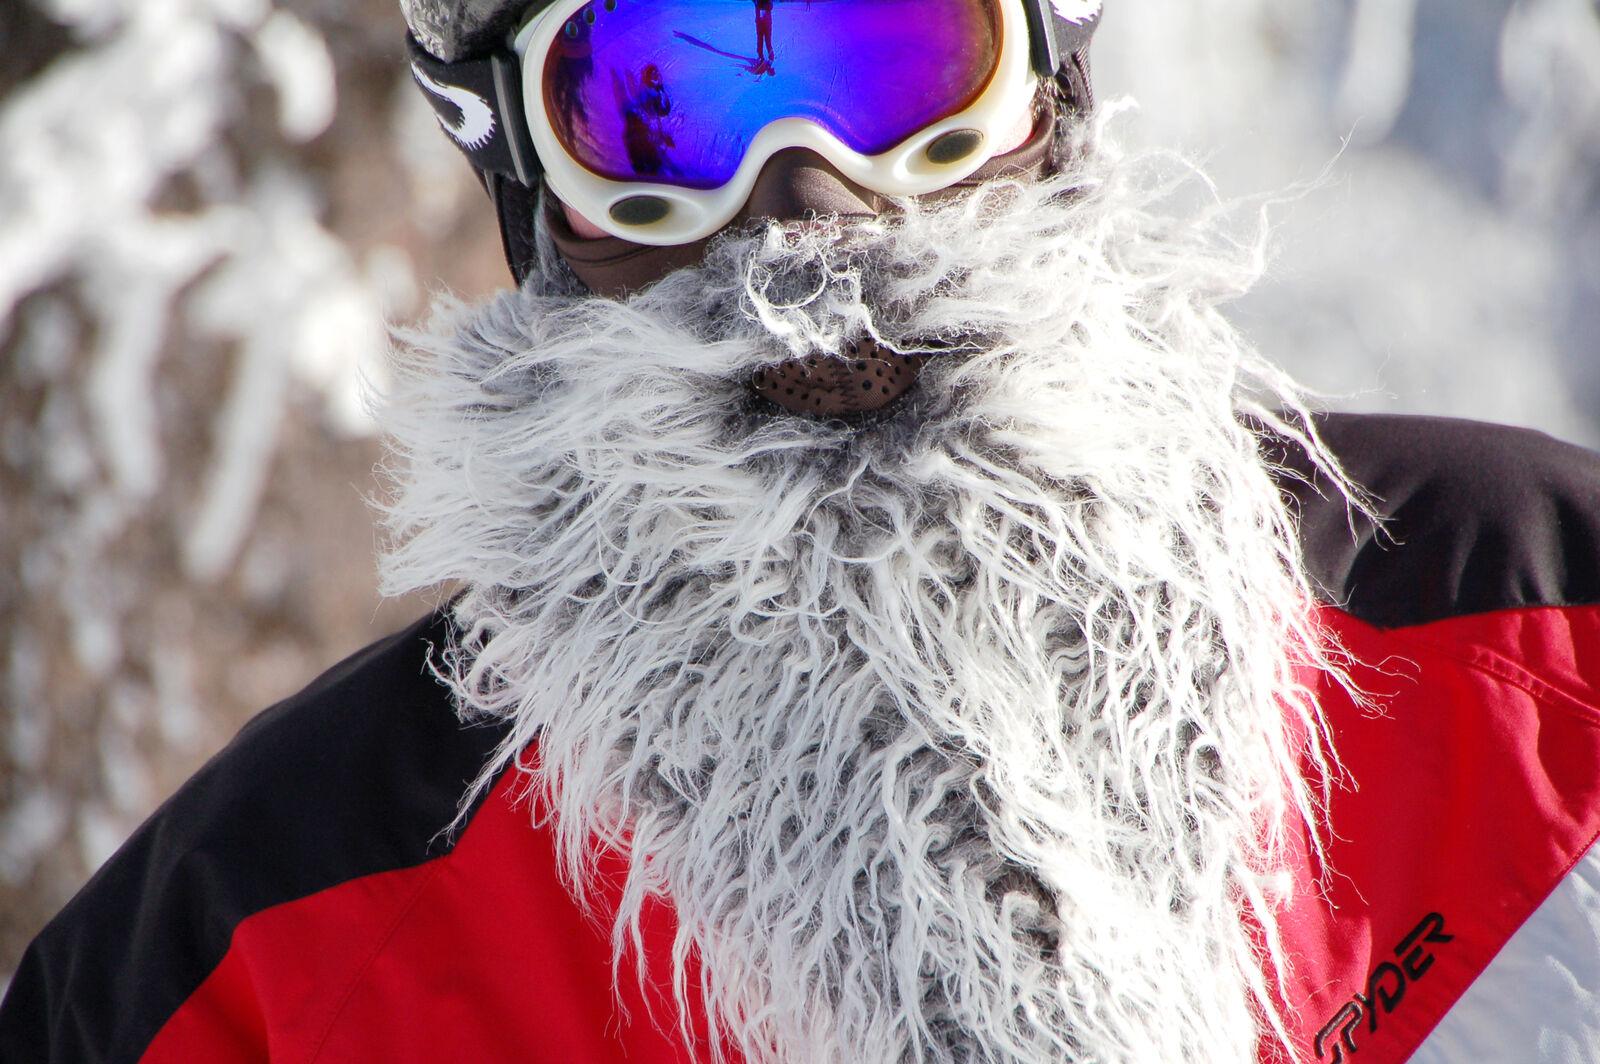 Beardski Biker Skimask Ski Mask SKI SNOWBOARDING One Size BRAND NEW